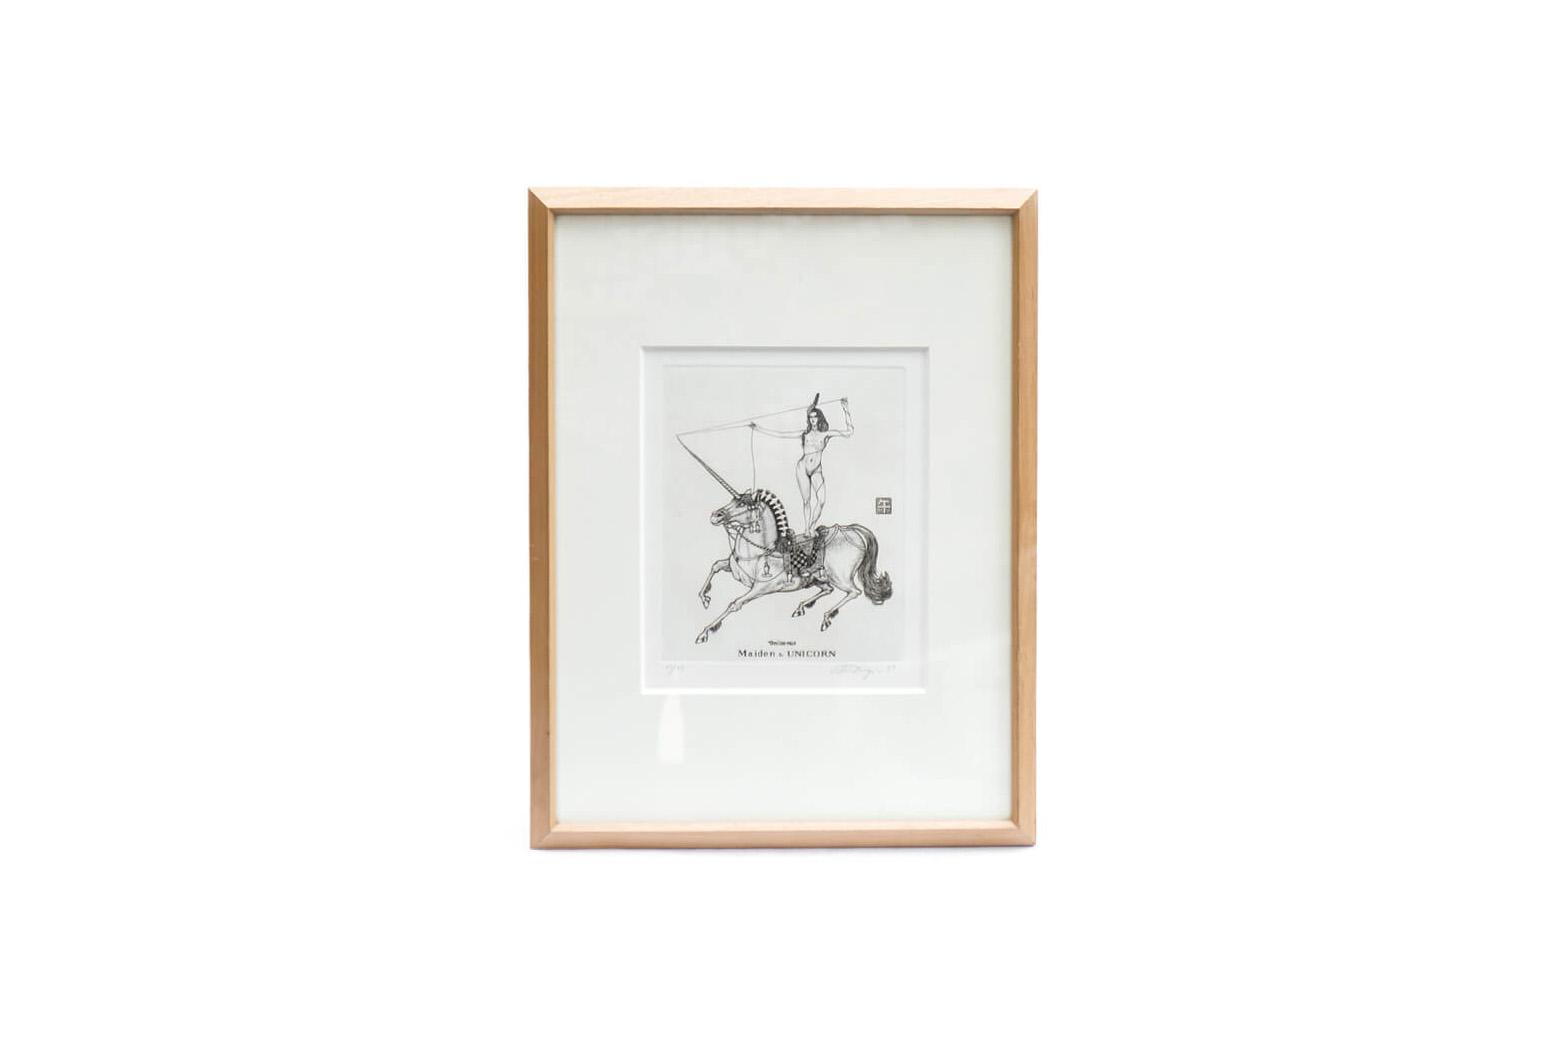 Taga Shin Copperplate Engraving Maiden & UNICORN/多賀 新 銅版画 額 美術 アート インテリア